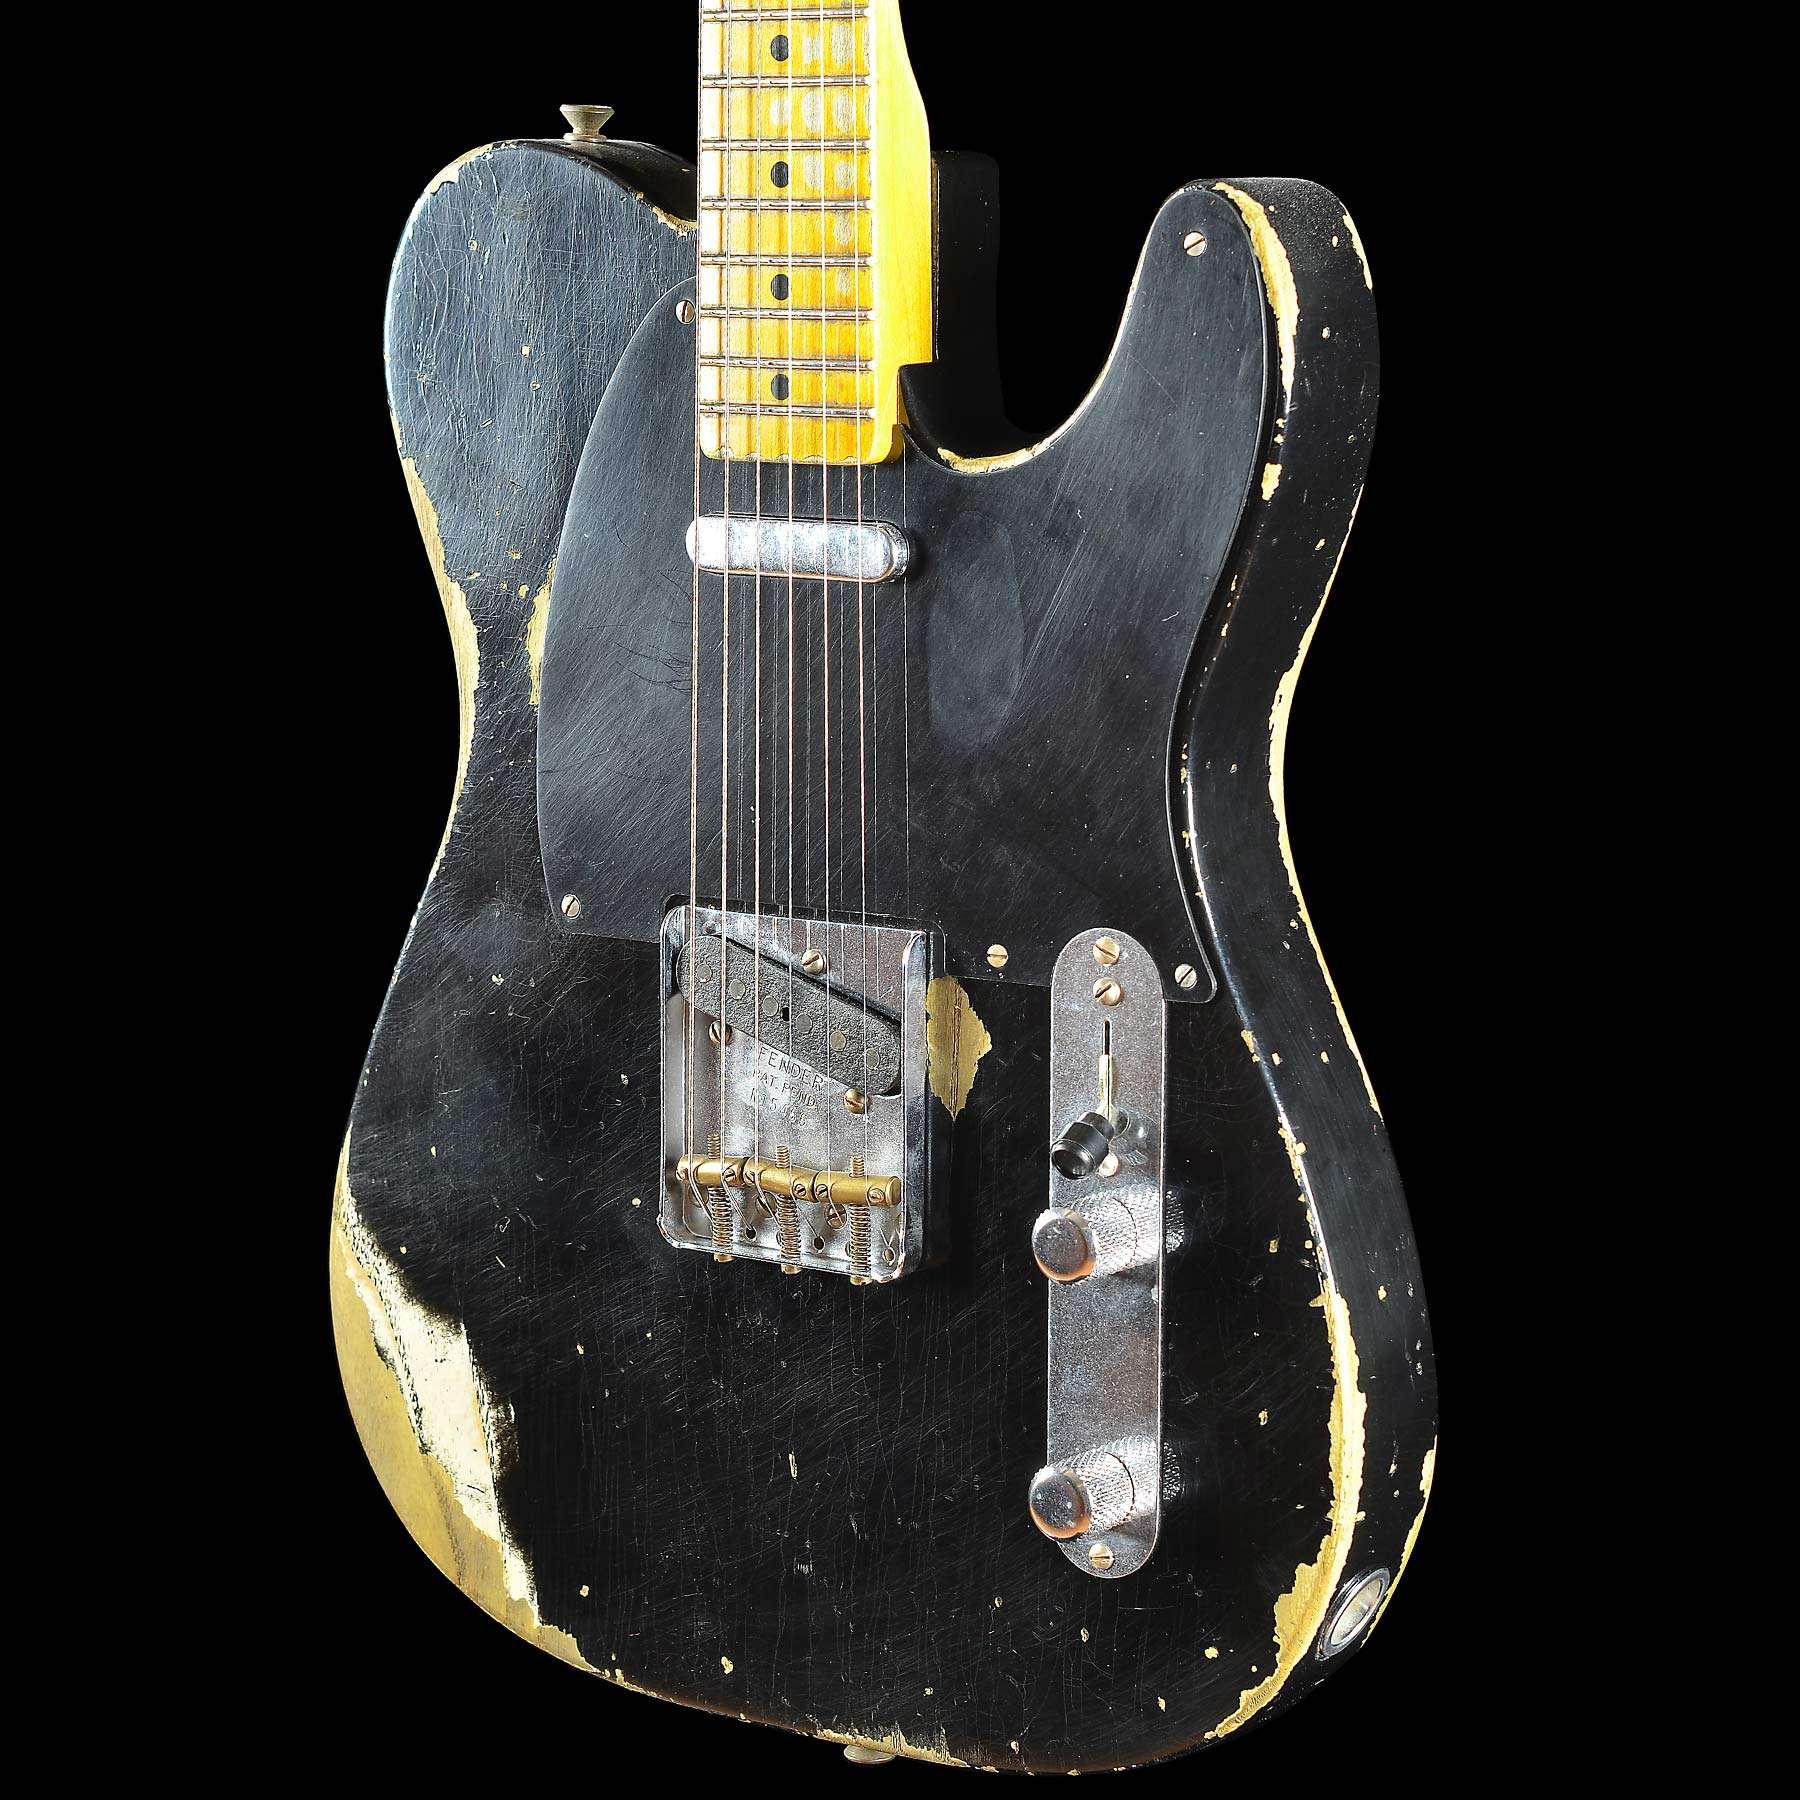 fender custom shop collection 1951 heavy relic telecaster faded black wild west guitars. Black Bedroom Furniture Sets. Home Design Ideas